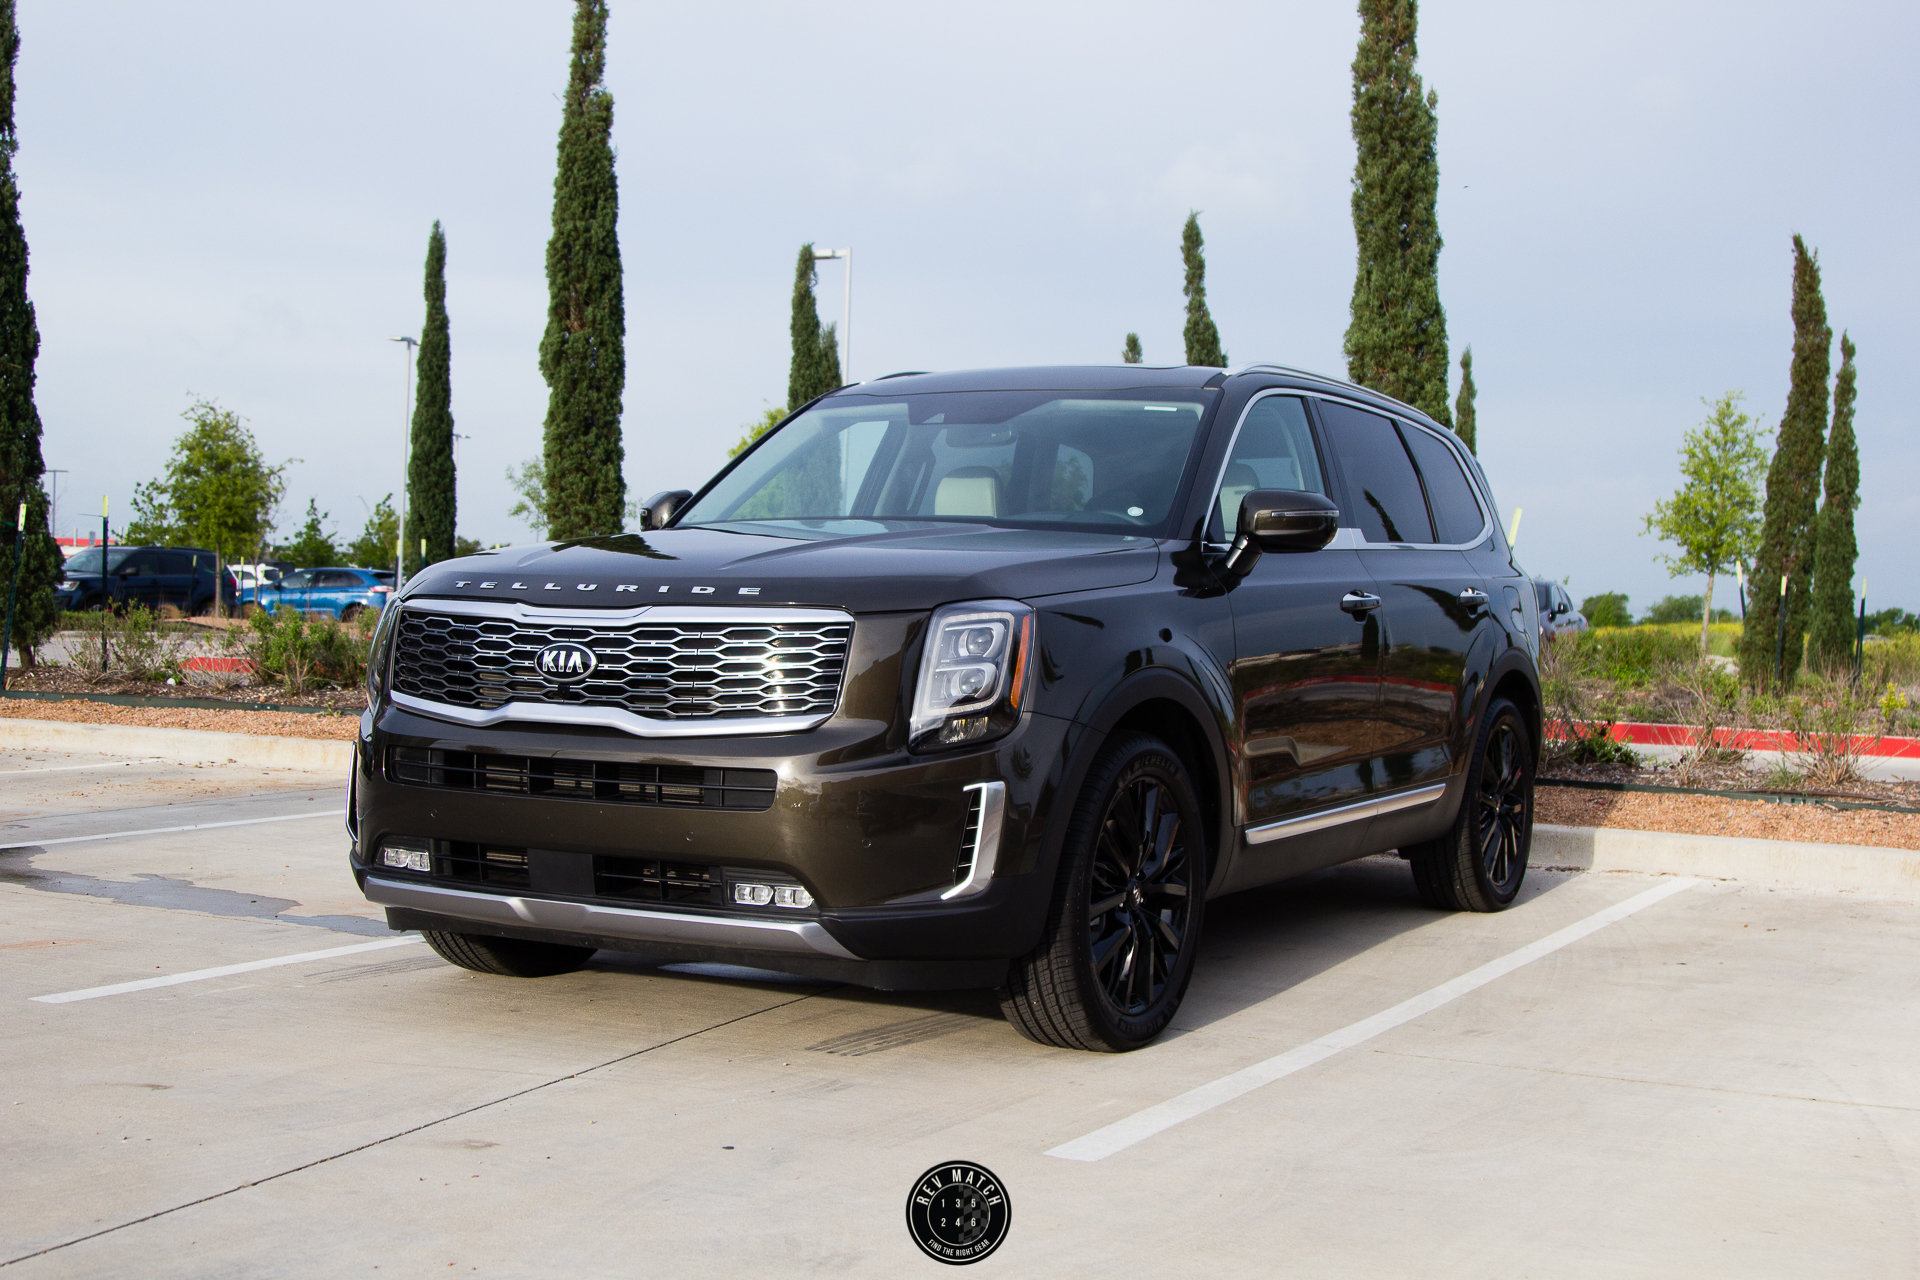 Texas Auto Roundup 2019 Rev Match Media-4.jpg